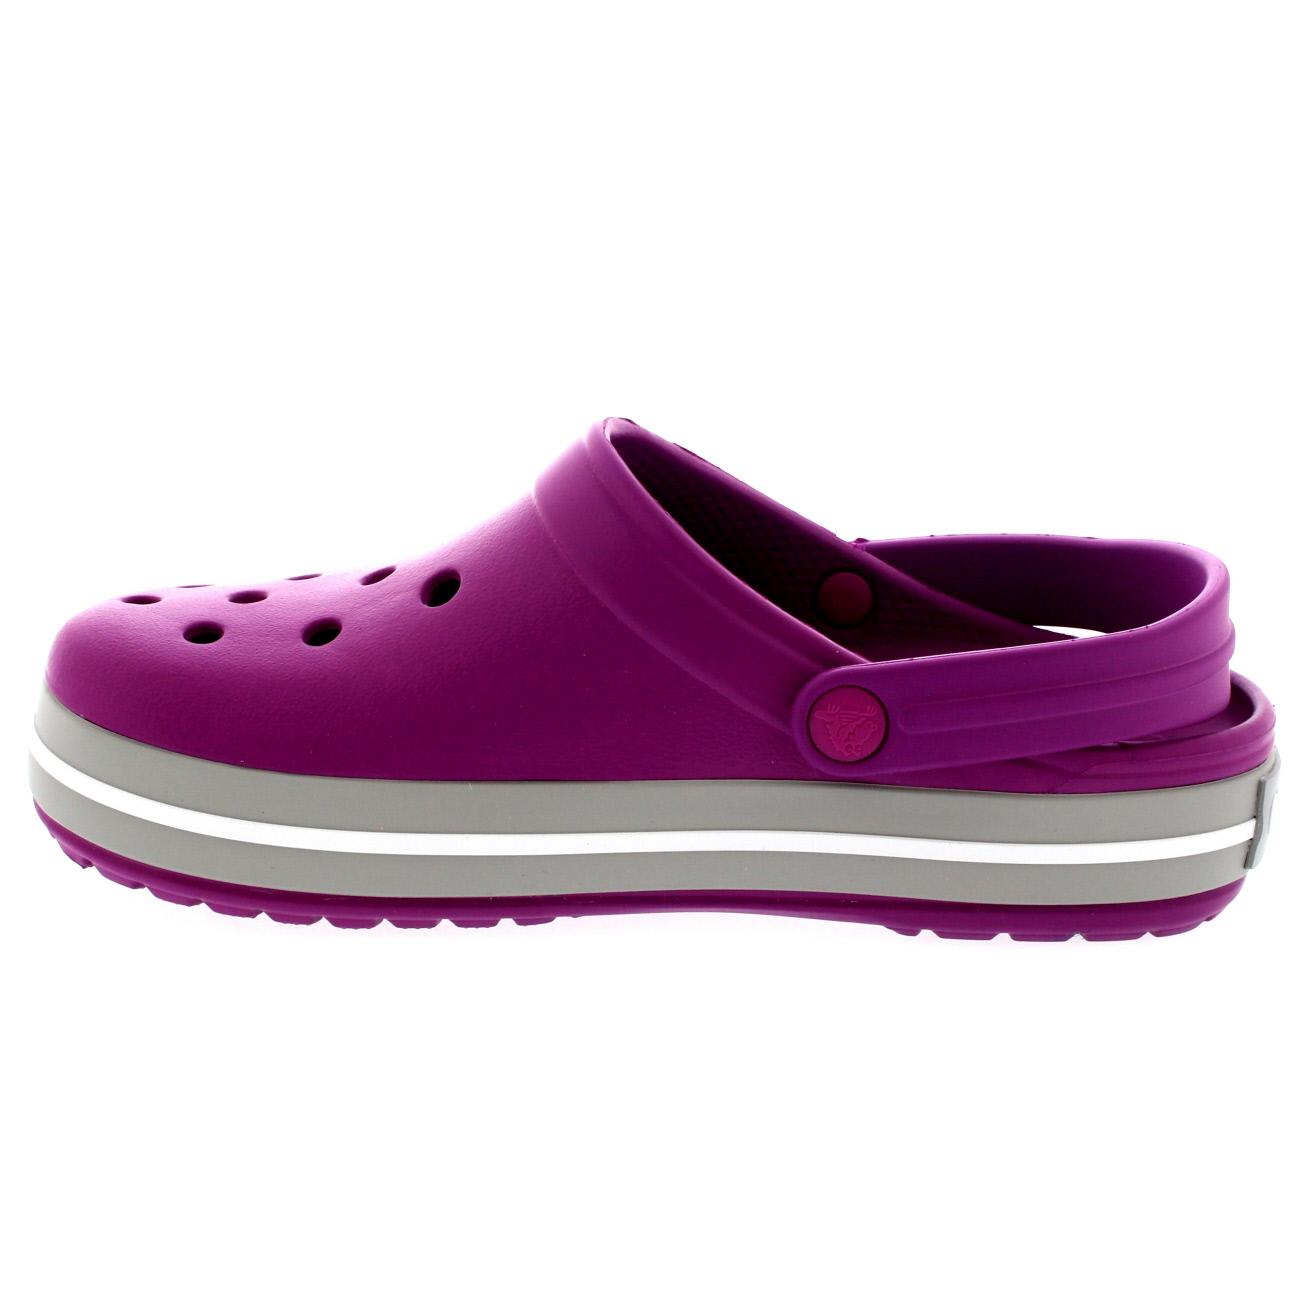 official photos 14b85 59ec1 Unisex-Womens-Mens-Crocs-Crocband-Summer-Mules-Slip-